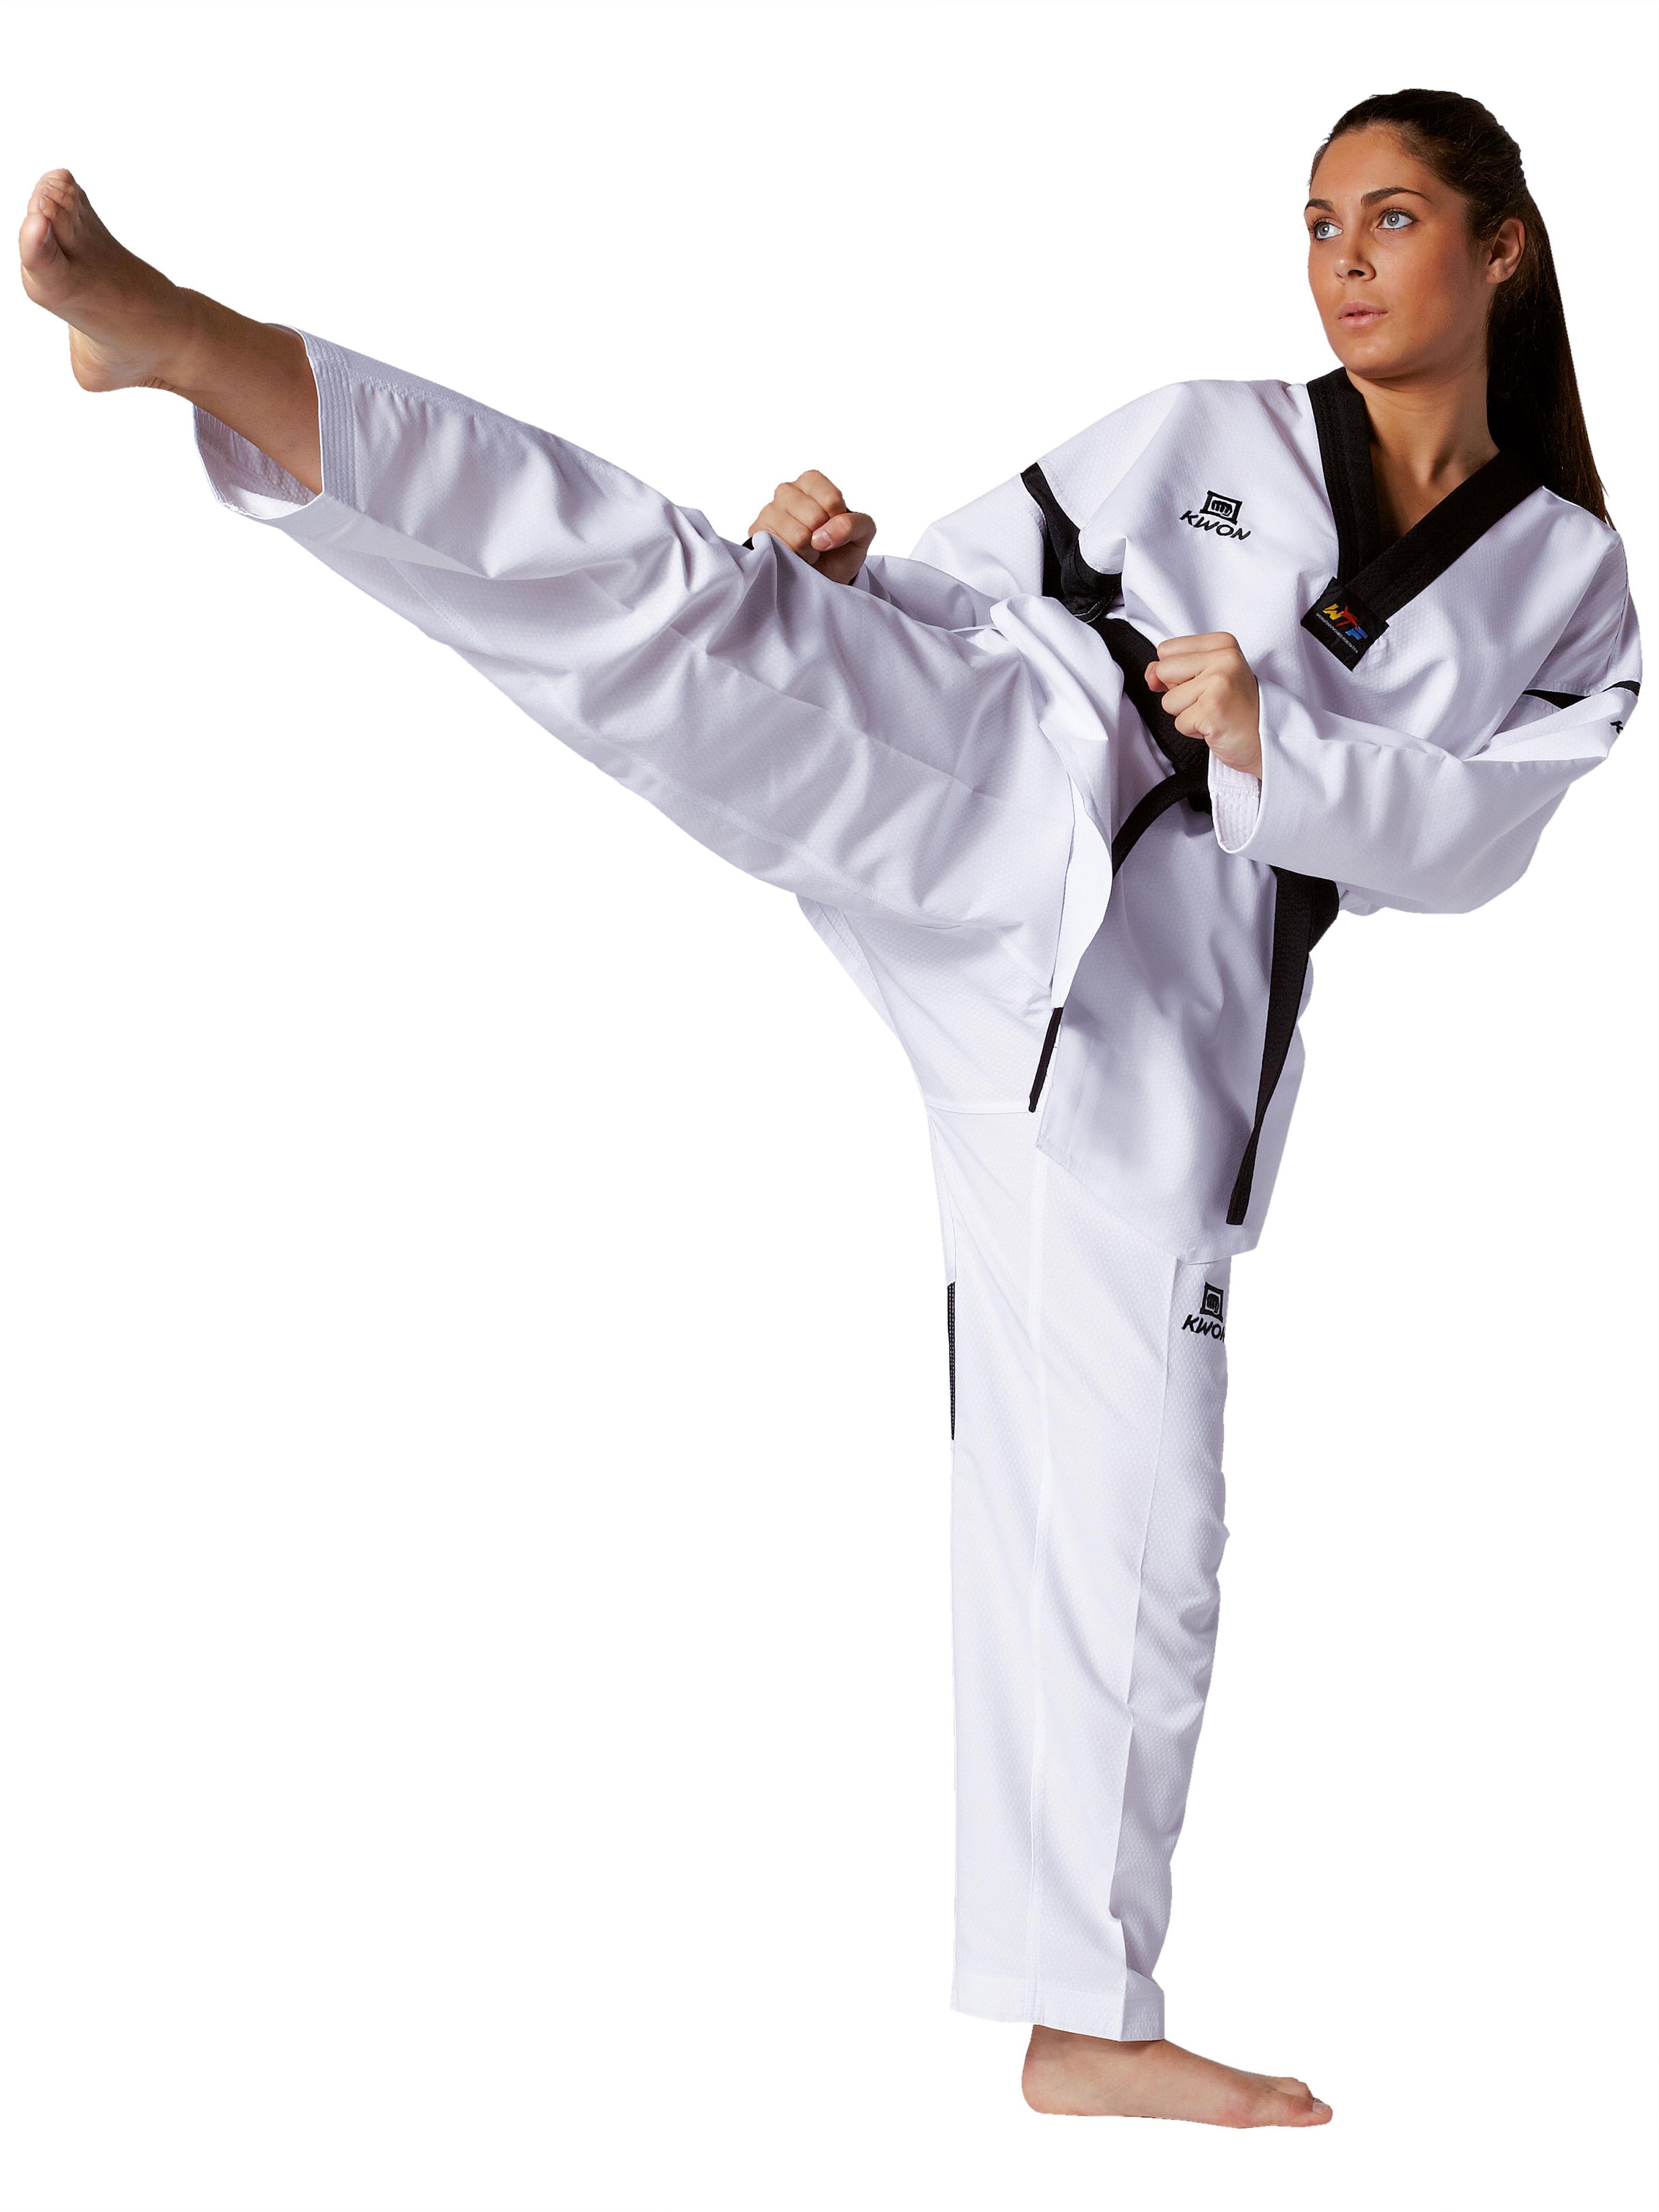 kwon kinder kampfsportanzug taekwondo song wei 120 cm. Black Bedroom Furniture Sets. Home Design Ideas